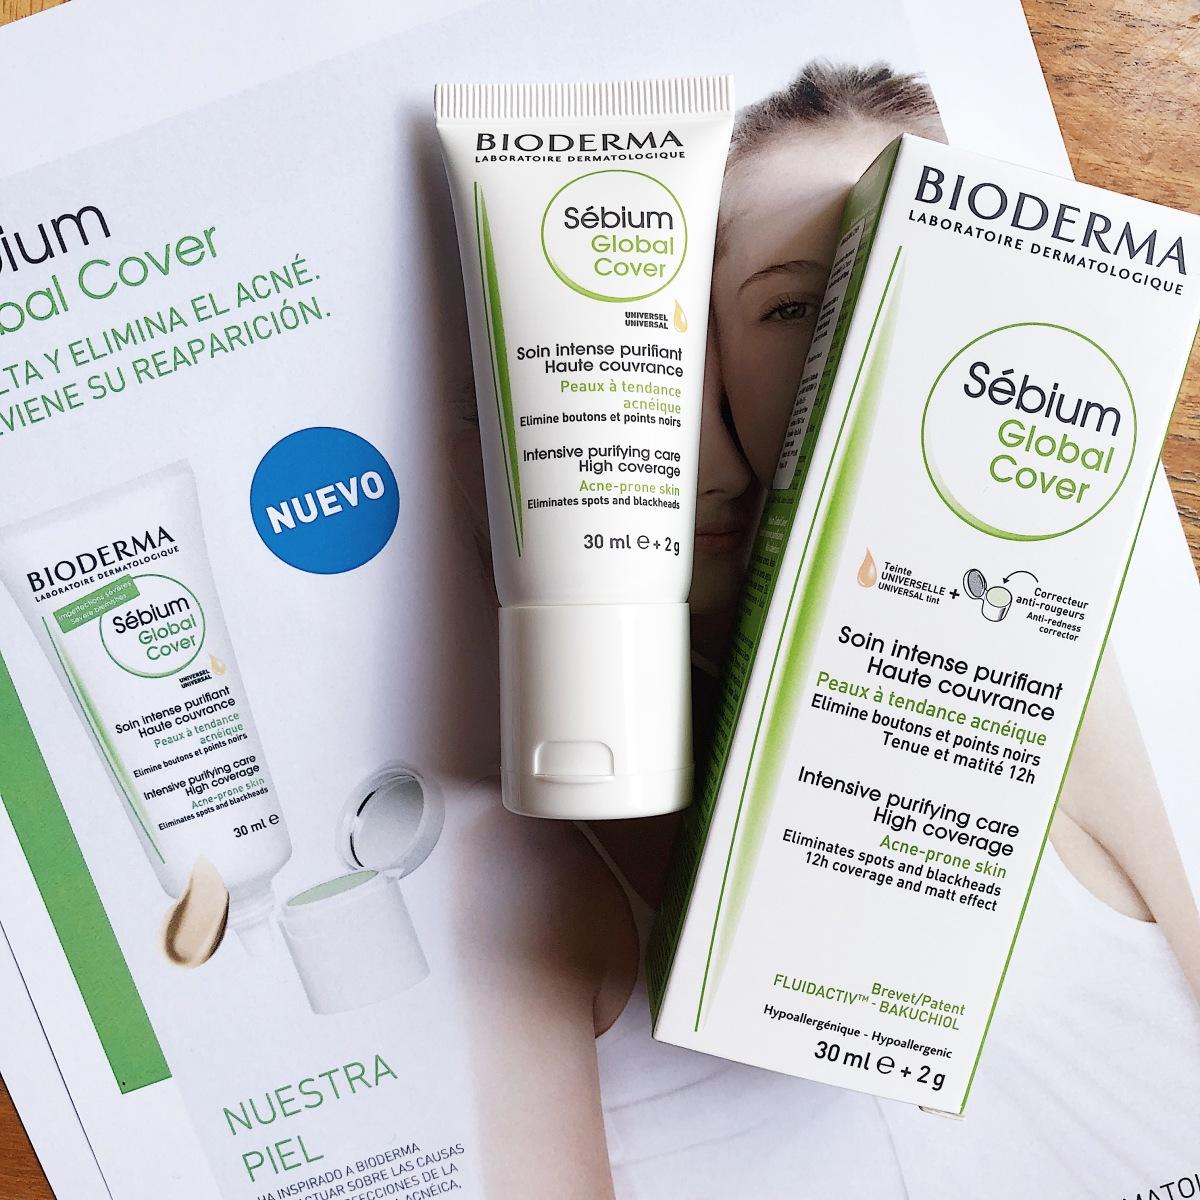 El maquillaje que trata las pieles acneicas: Sébium Global Cover de Bioderma